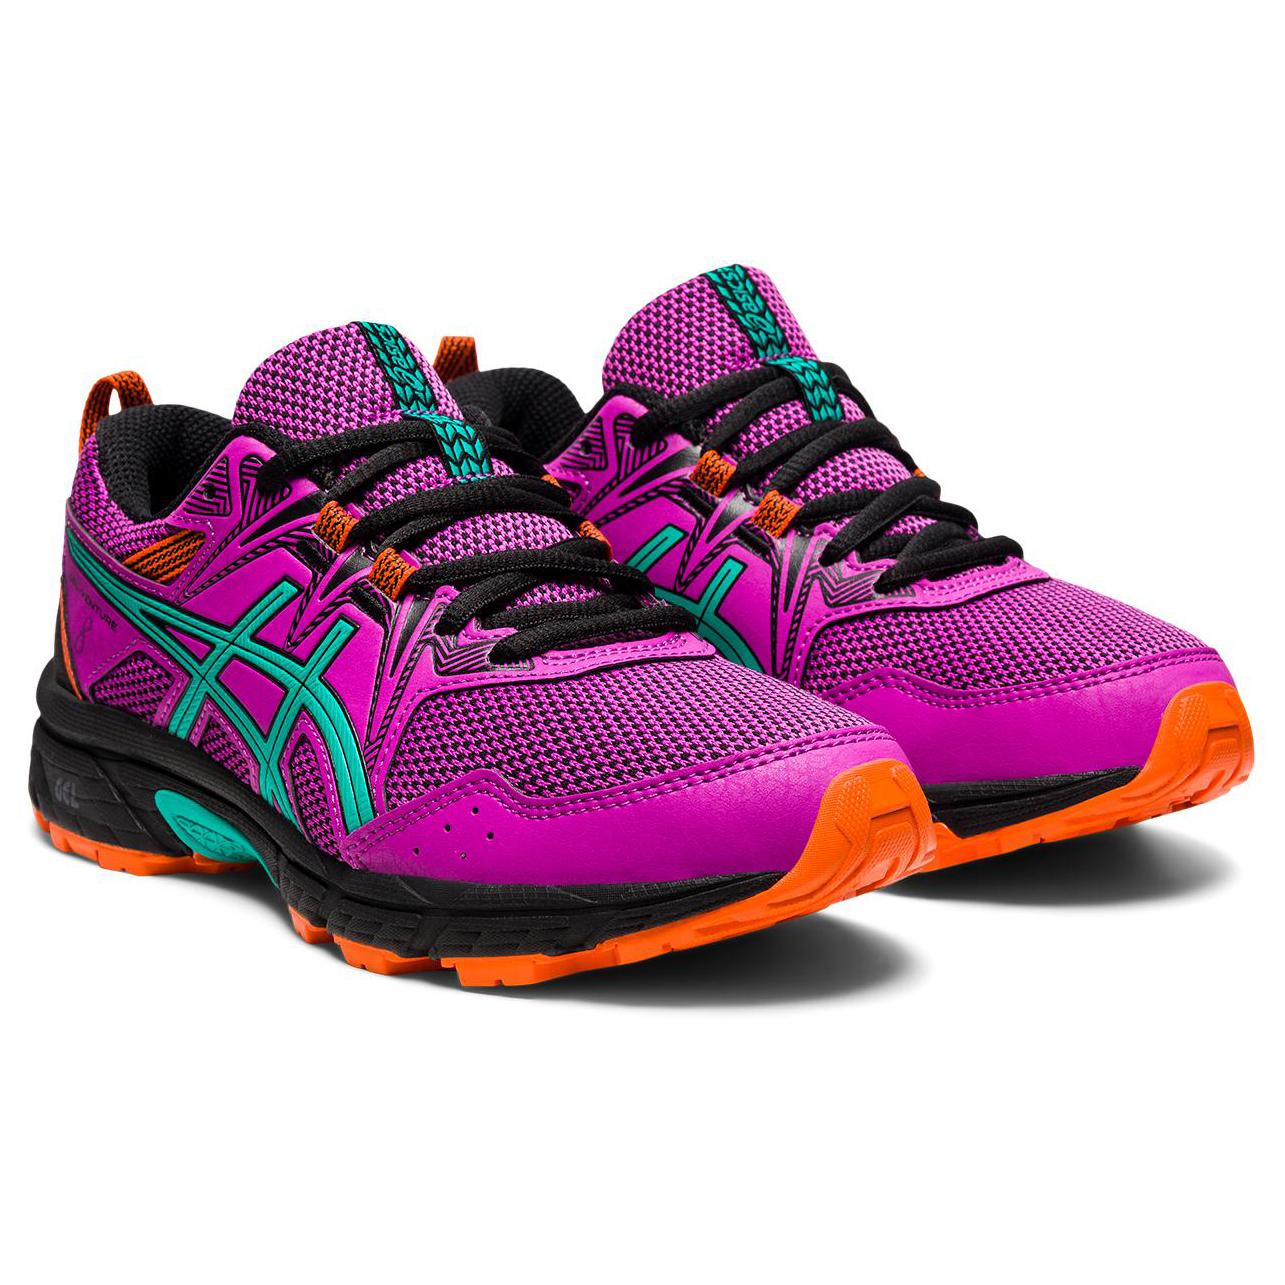 Asics - Kid's Gel-Venture 8 GS - Multisport shoes - Digital Grape / Baltic Jewel | 1 (US)